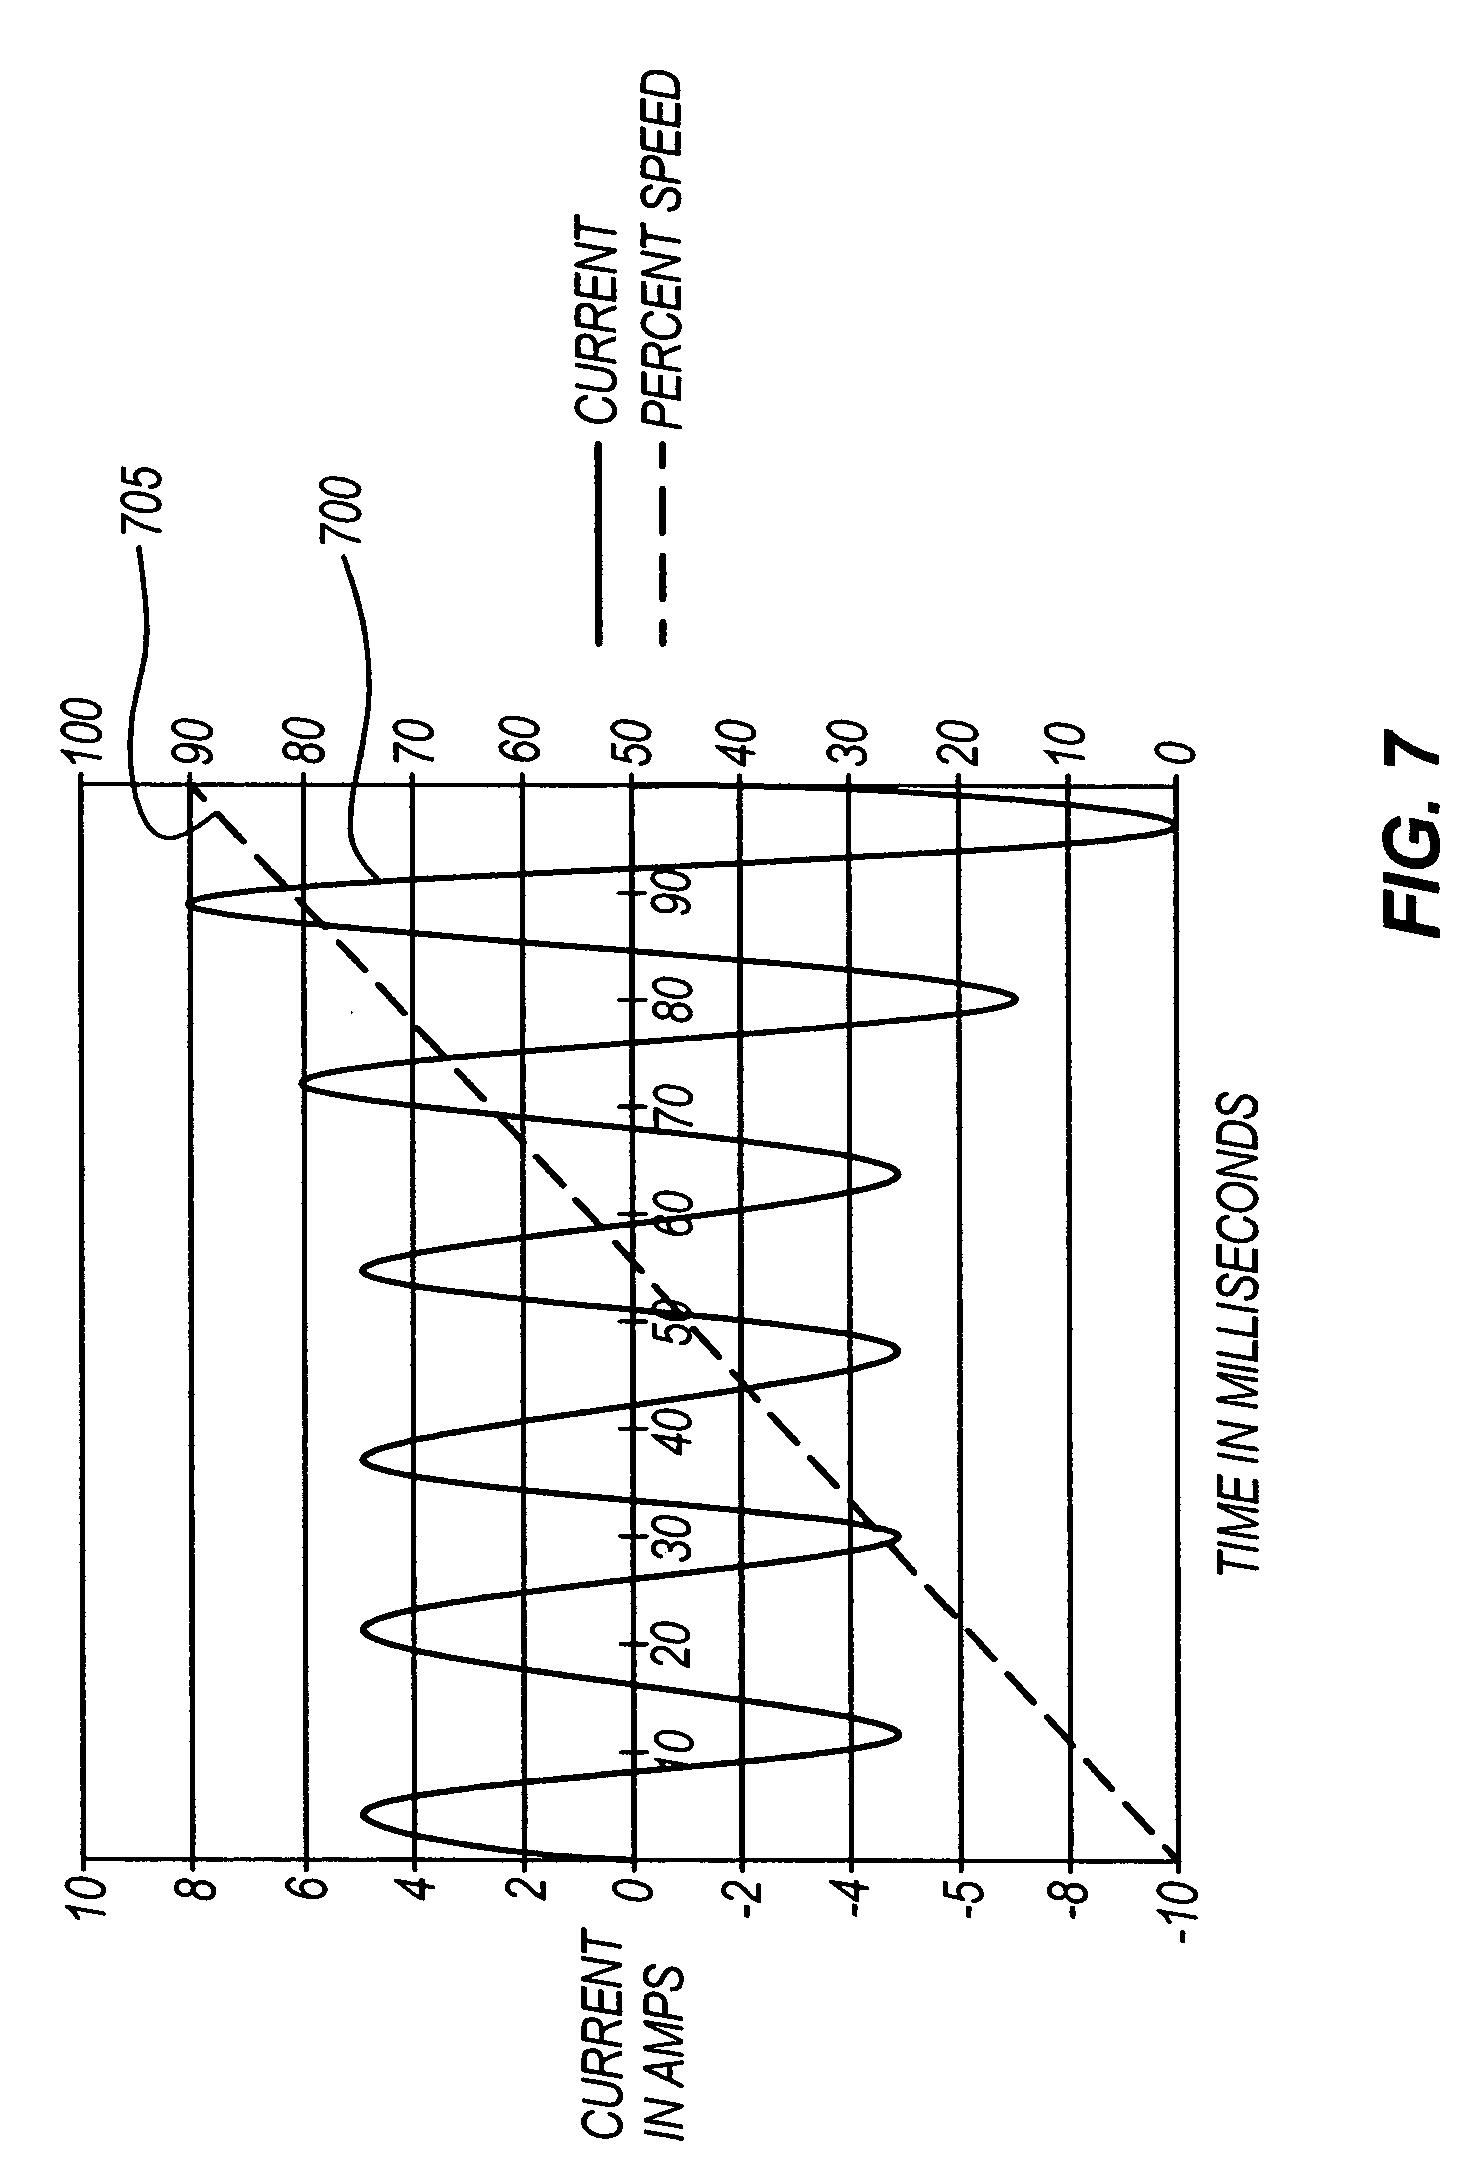 Ls1 Dual Fan Relay Wiring Diagram Diagrams Electric 96 Impala Sensor Cooling